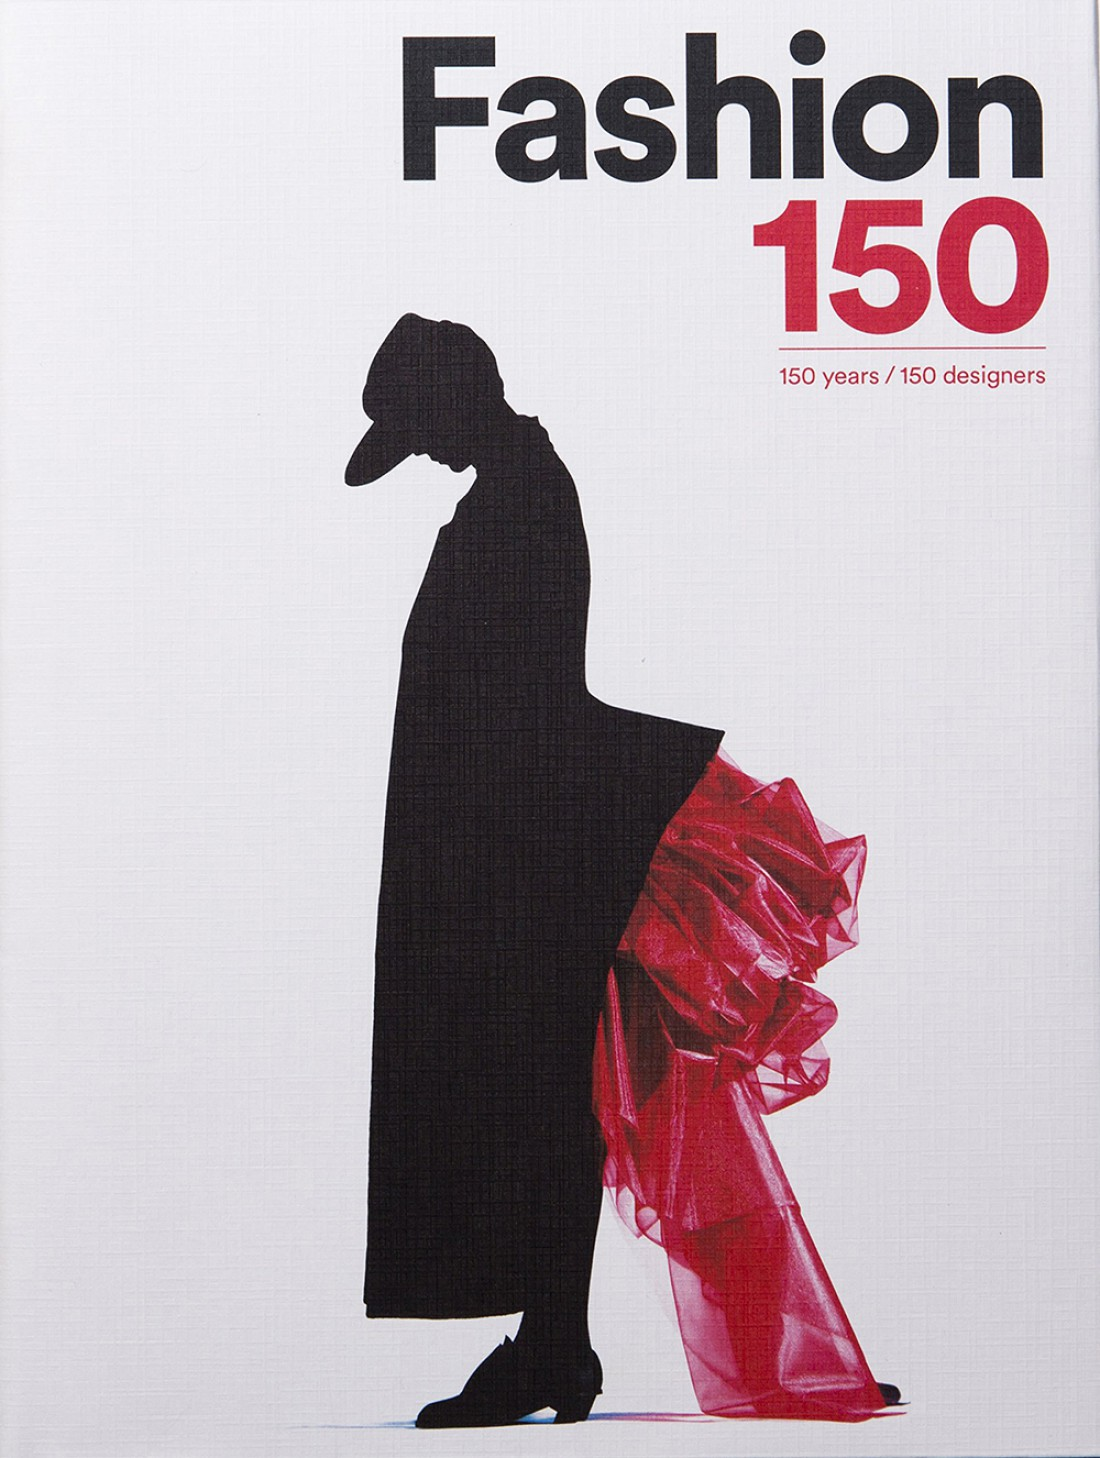 Мода 150: 150 лет/150 дизайнеров, Арианна Пьяцца